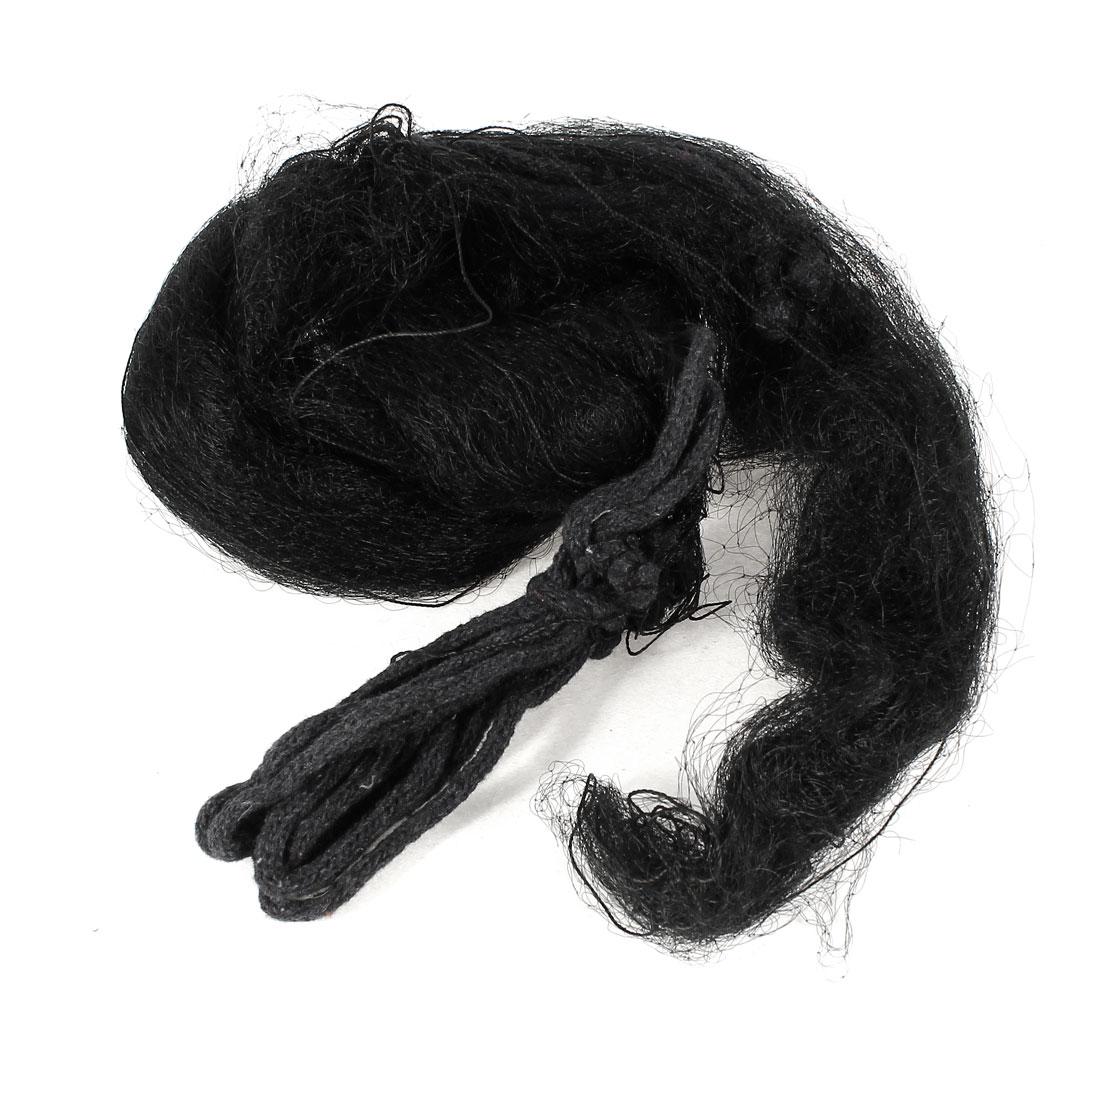 25mm Hole Garden Anti Bird Netting Nylon Knotted Mist Net Black 12 x 2.5m